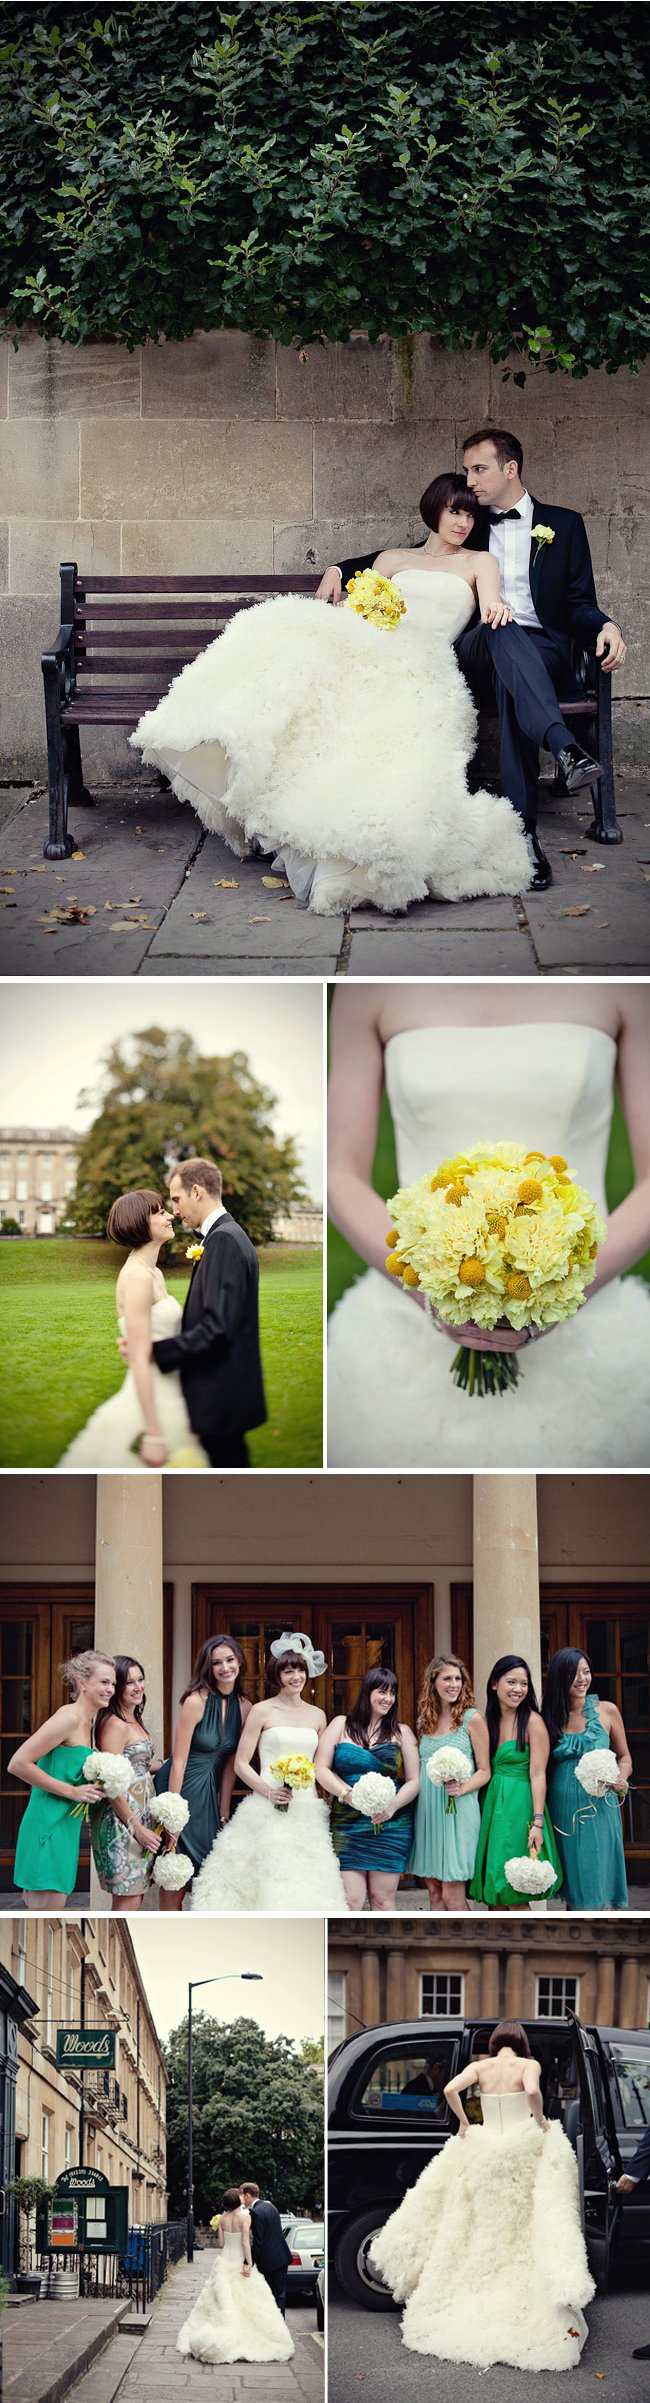 elegant real weddings yellow bridal bouquet dramatic ballgown wedding dress